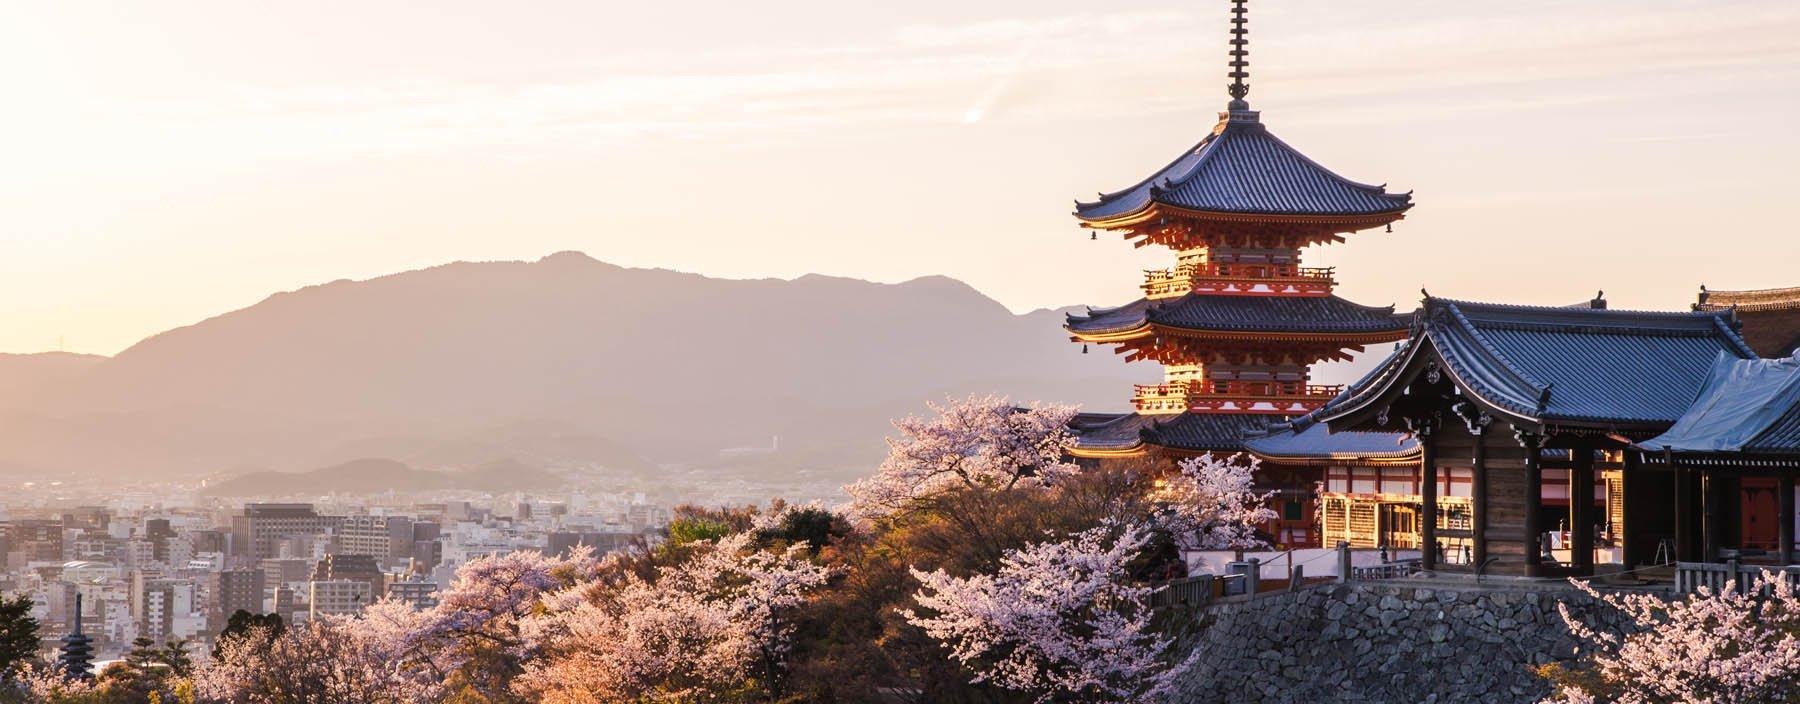 jp, kyoto, kiyomizu-dera temple.jpg